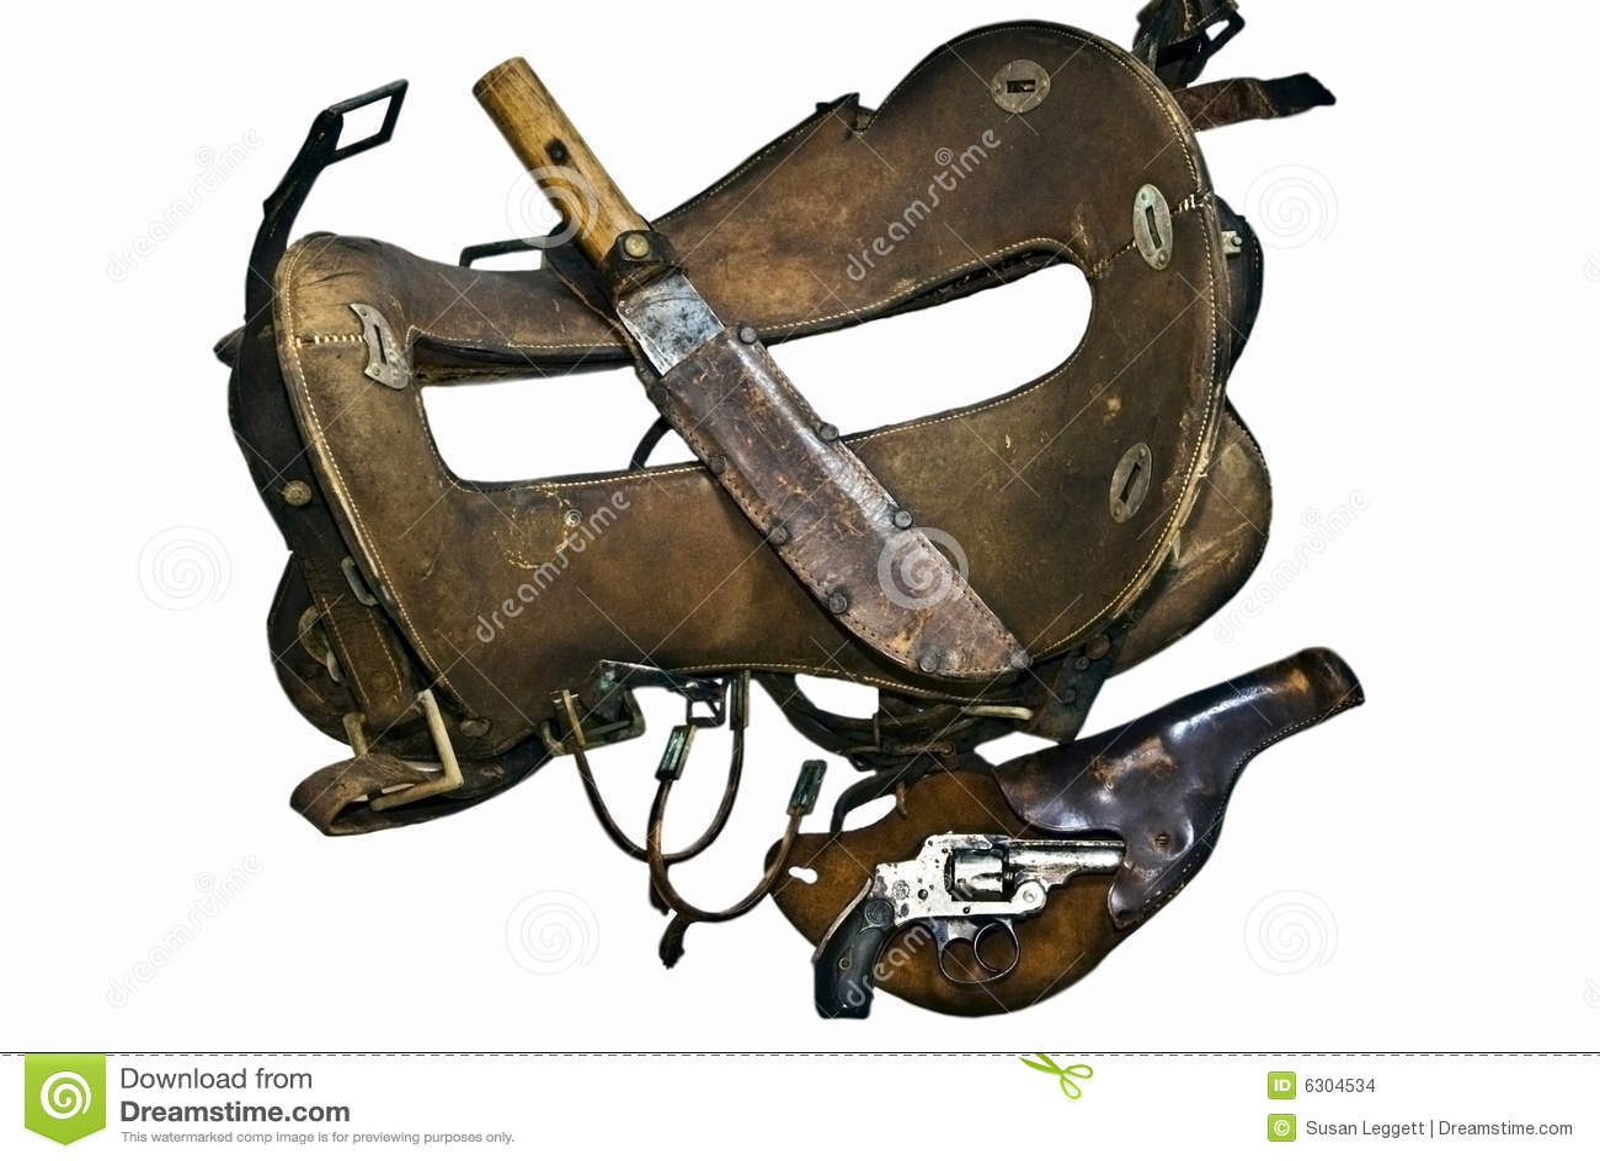 Download Old Saddle,Gun,Knife,Spurs stock photo. Image of american - 6304534